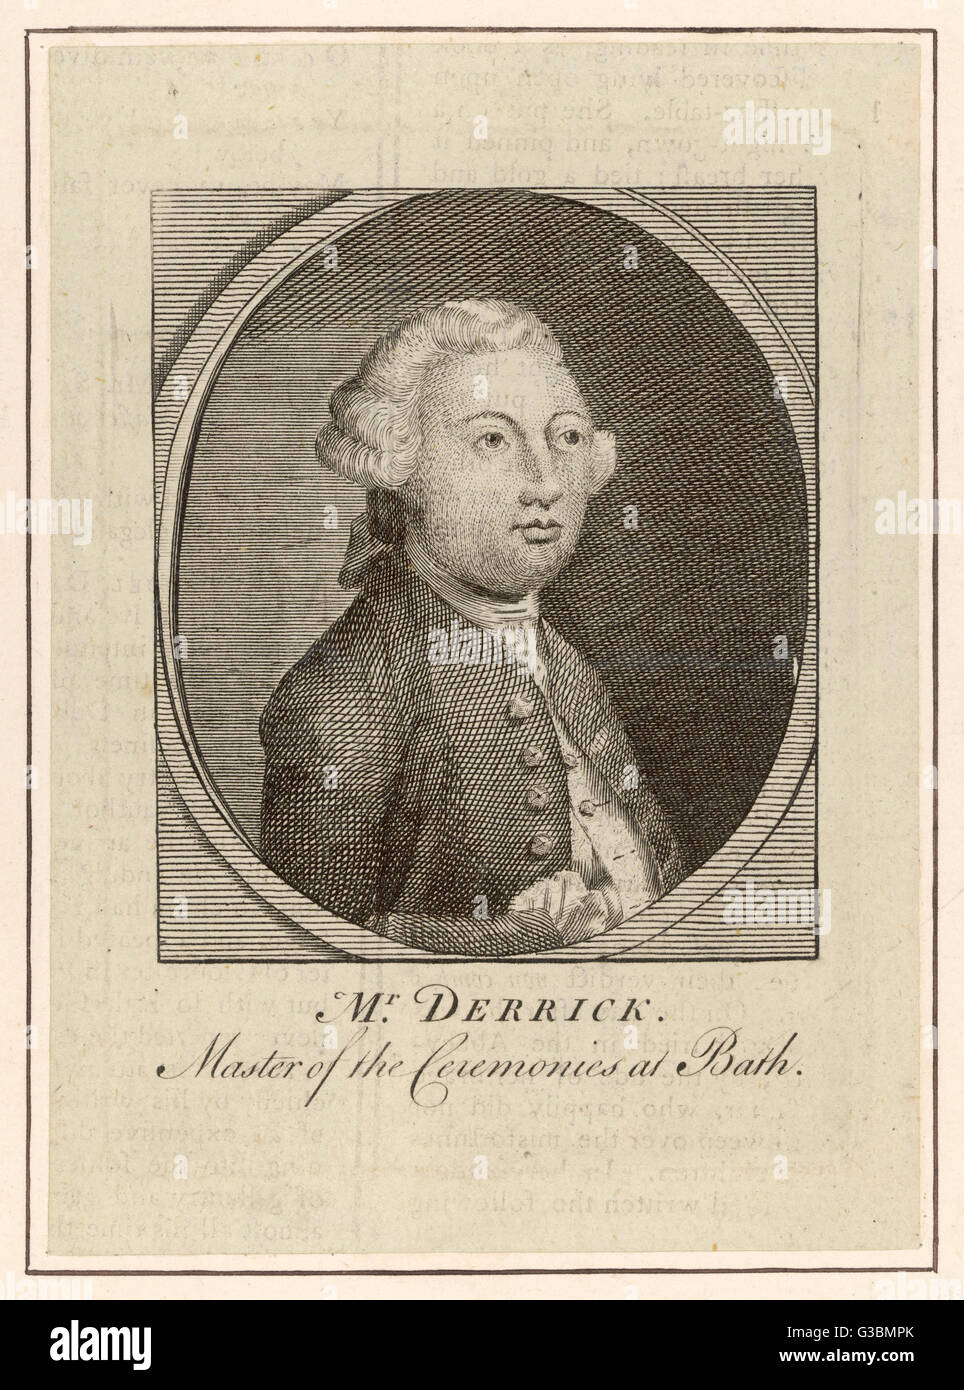 SAMUEL DERRICK Poet, and Master of Ceremonies  at Bath.        Date: 1724 - 1769 - Stock Image